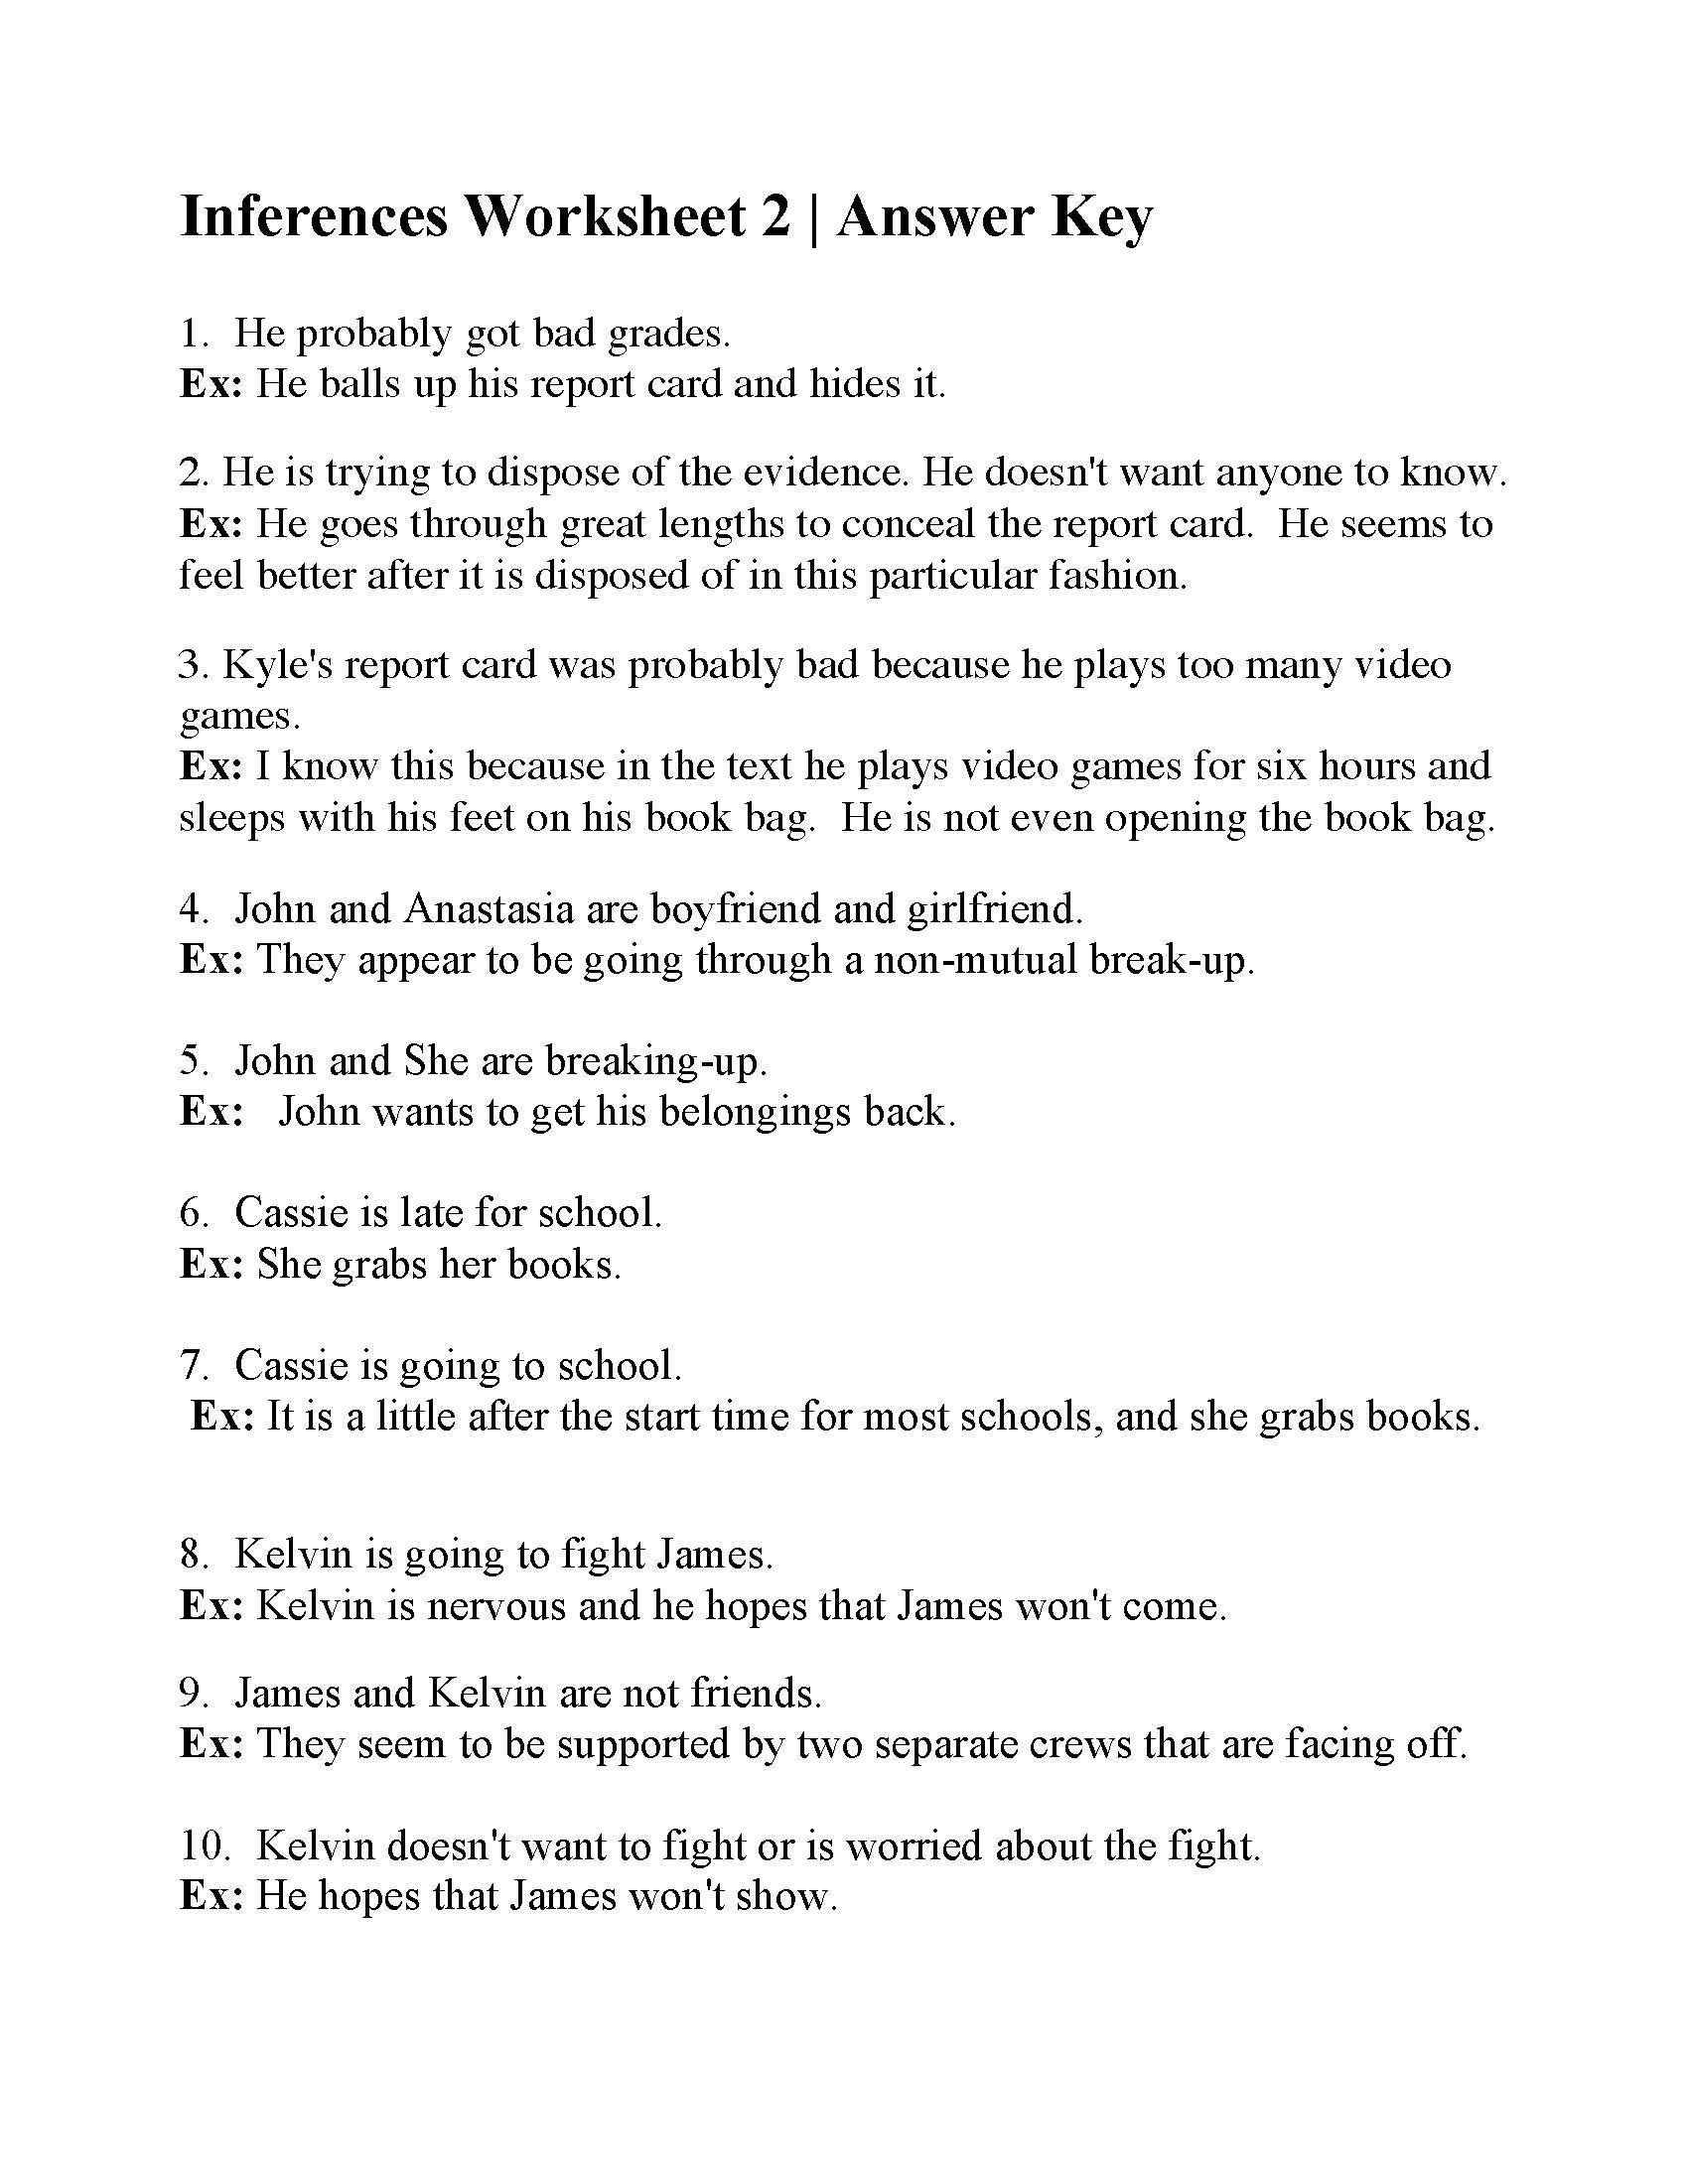 Making Inference Worksheets 4th Grade Inferences Worksheet 2